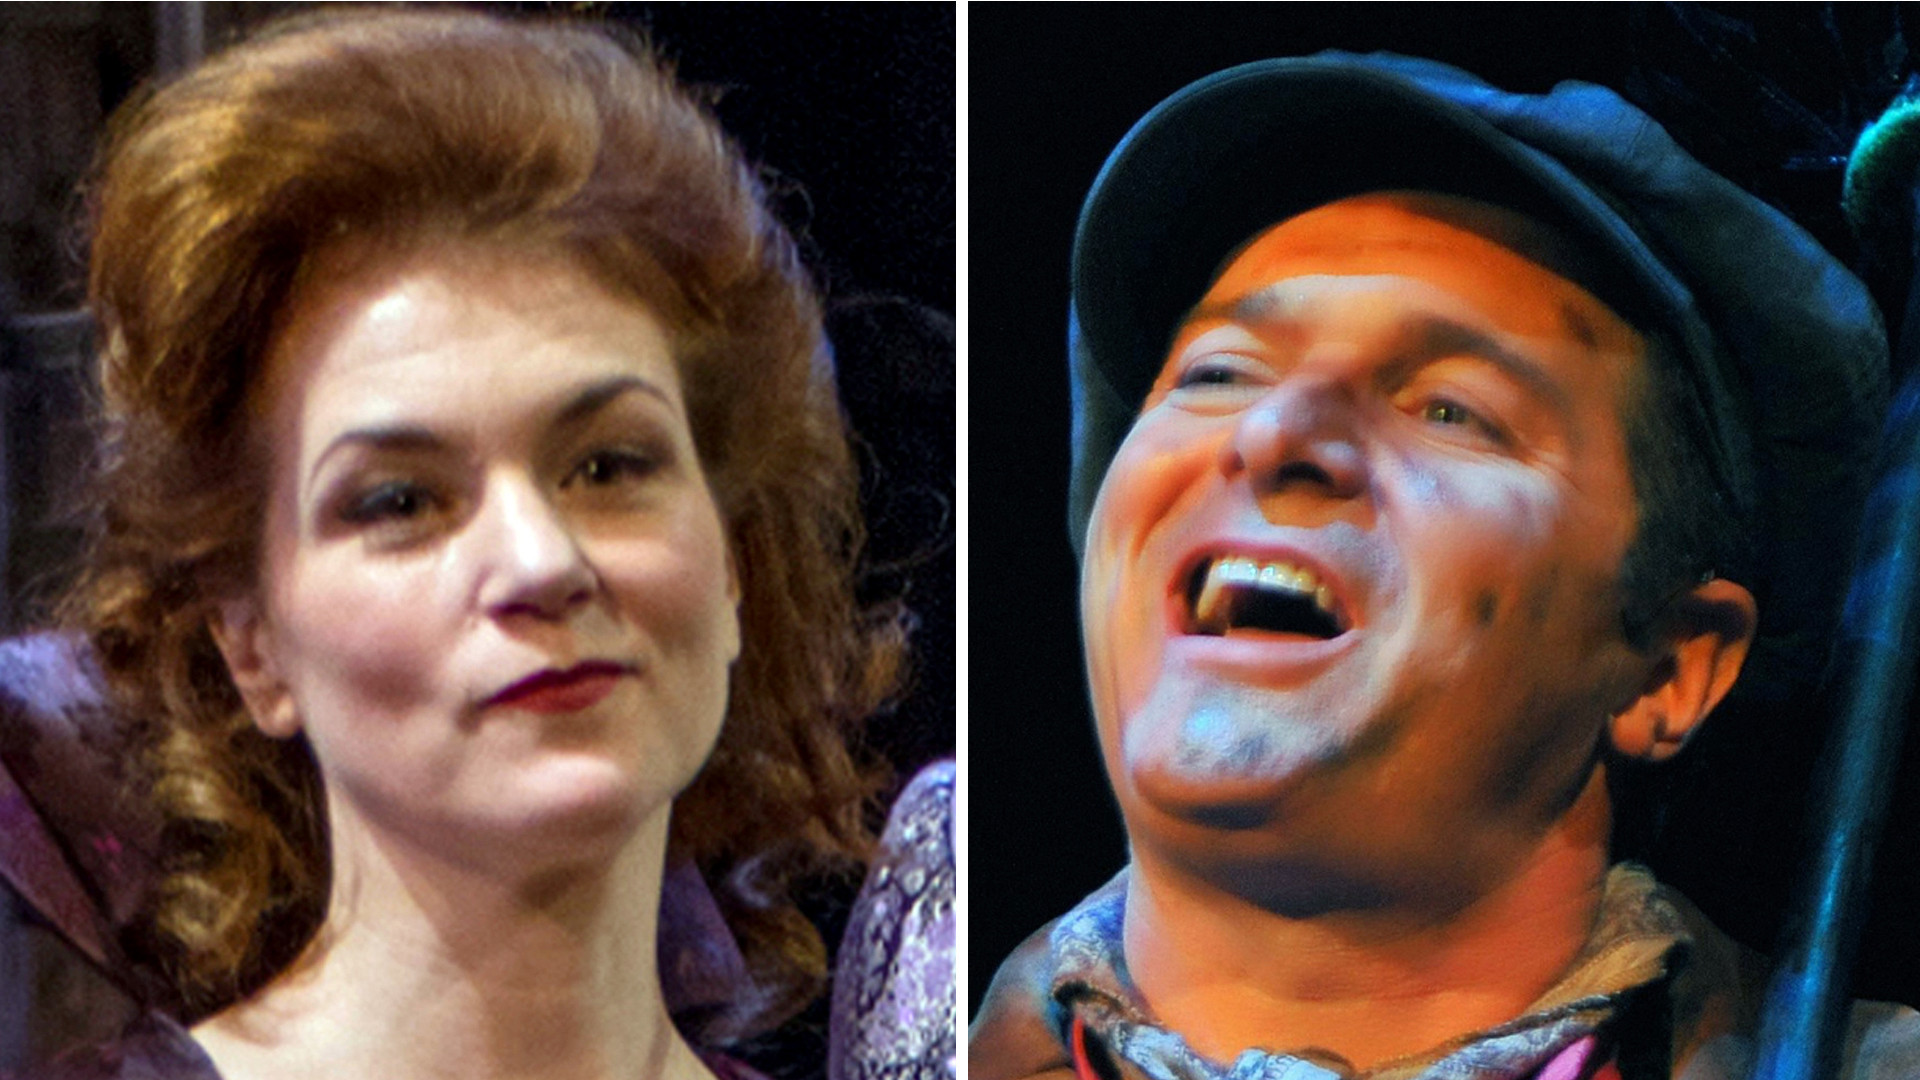 Chicago actors Molly Glynn, Bernie Yvon die in separate accidents